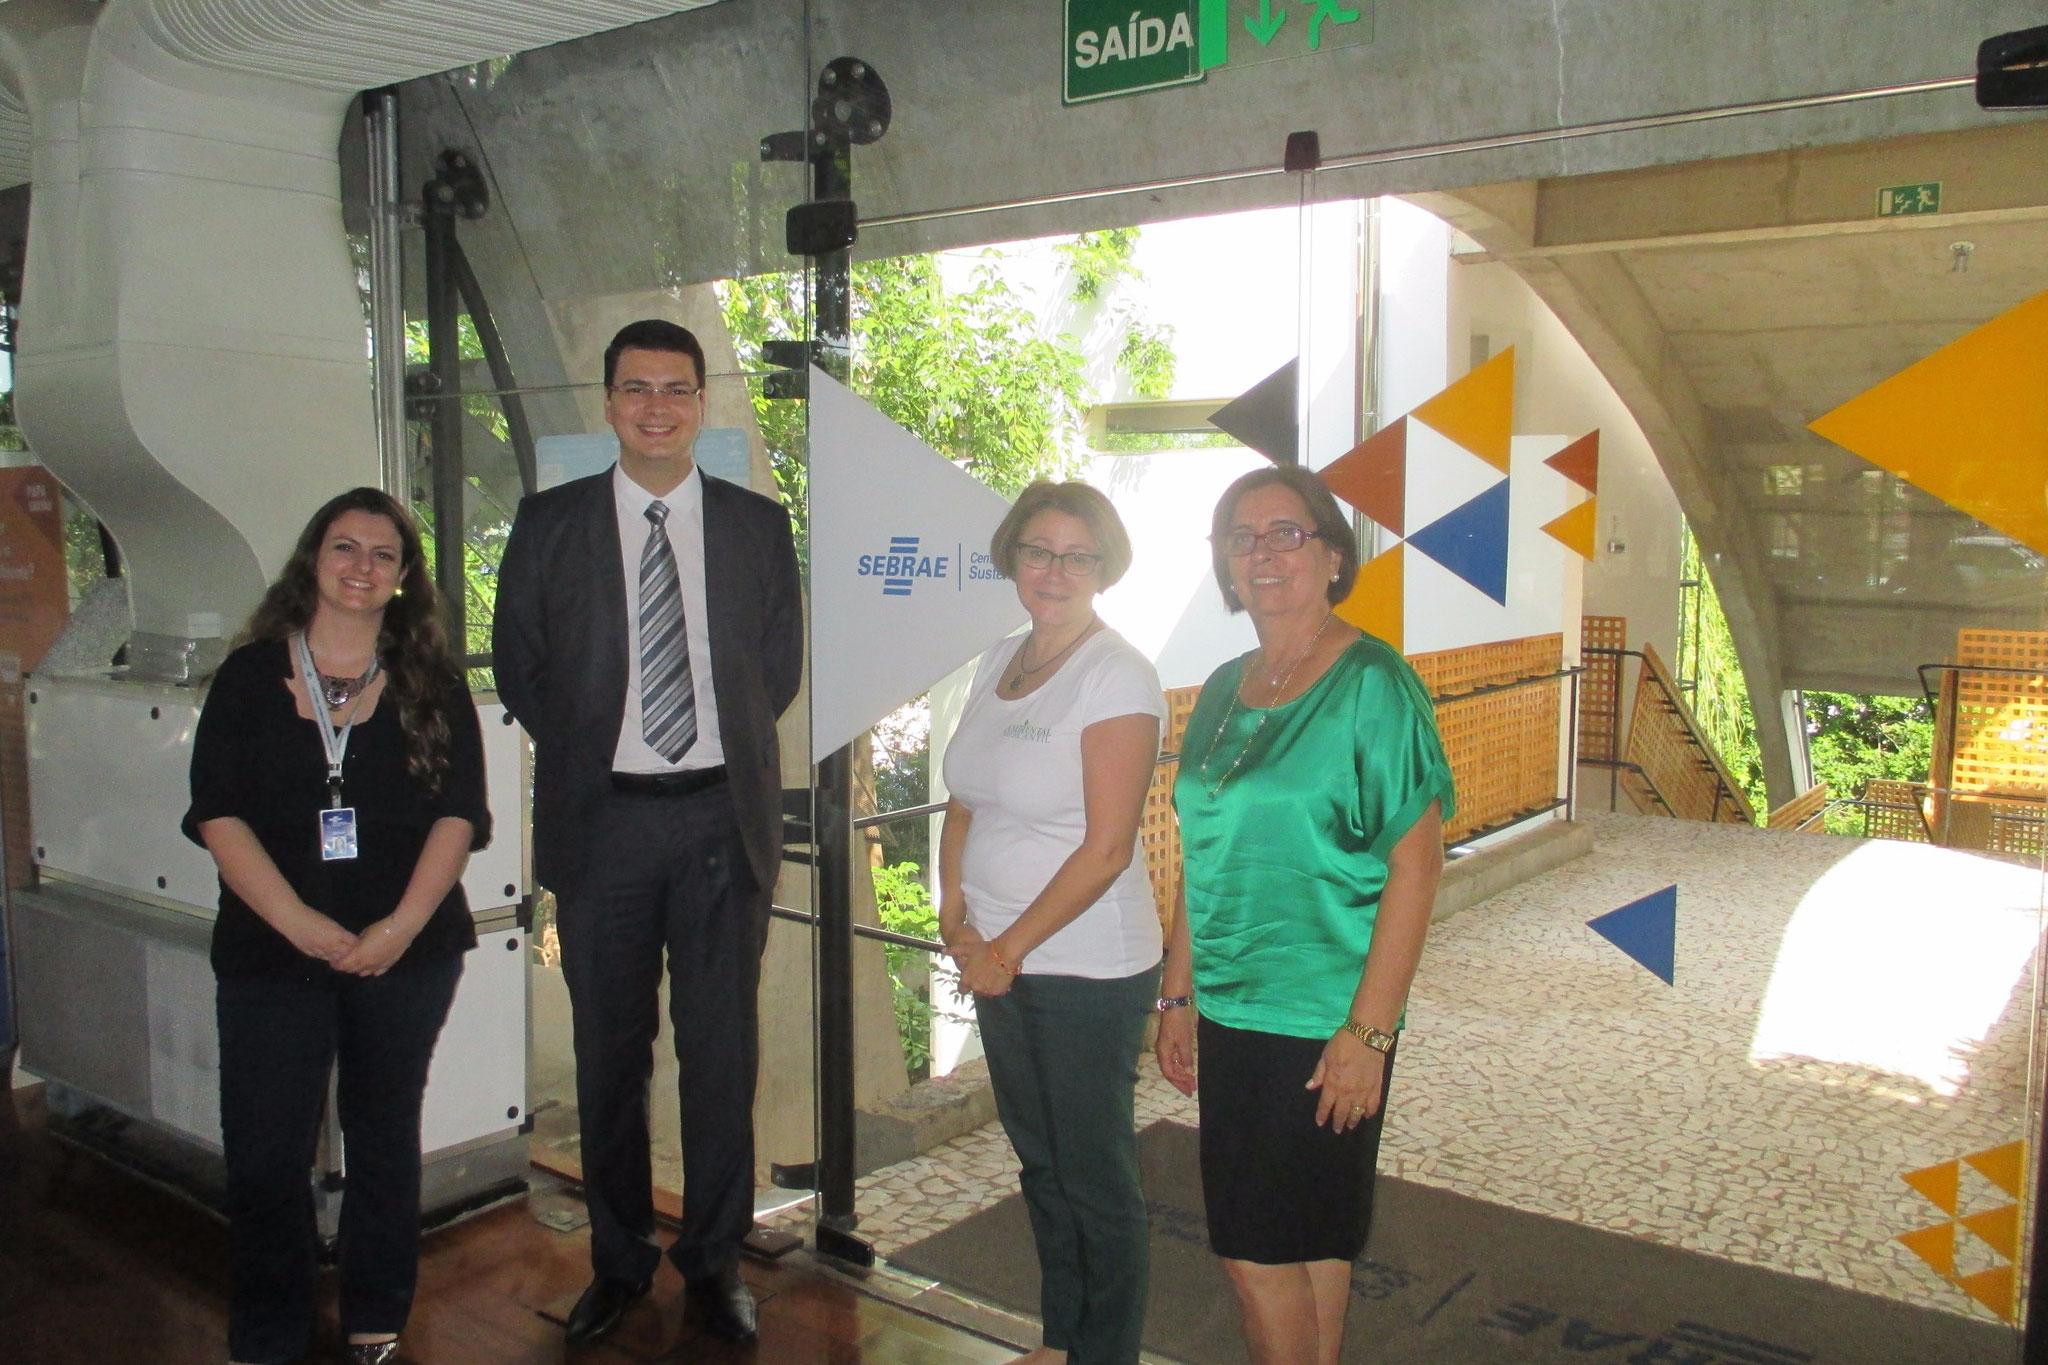 Visiting SEBRAE Sustentabilidade in 2015, Cuiaba MT, Brazil.